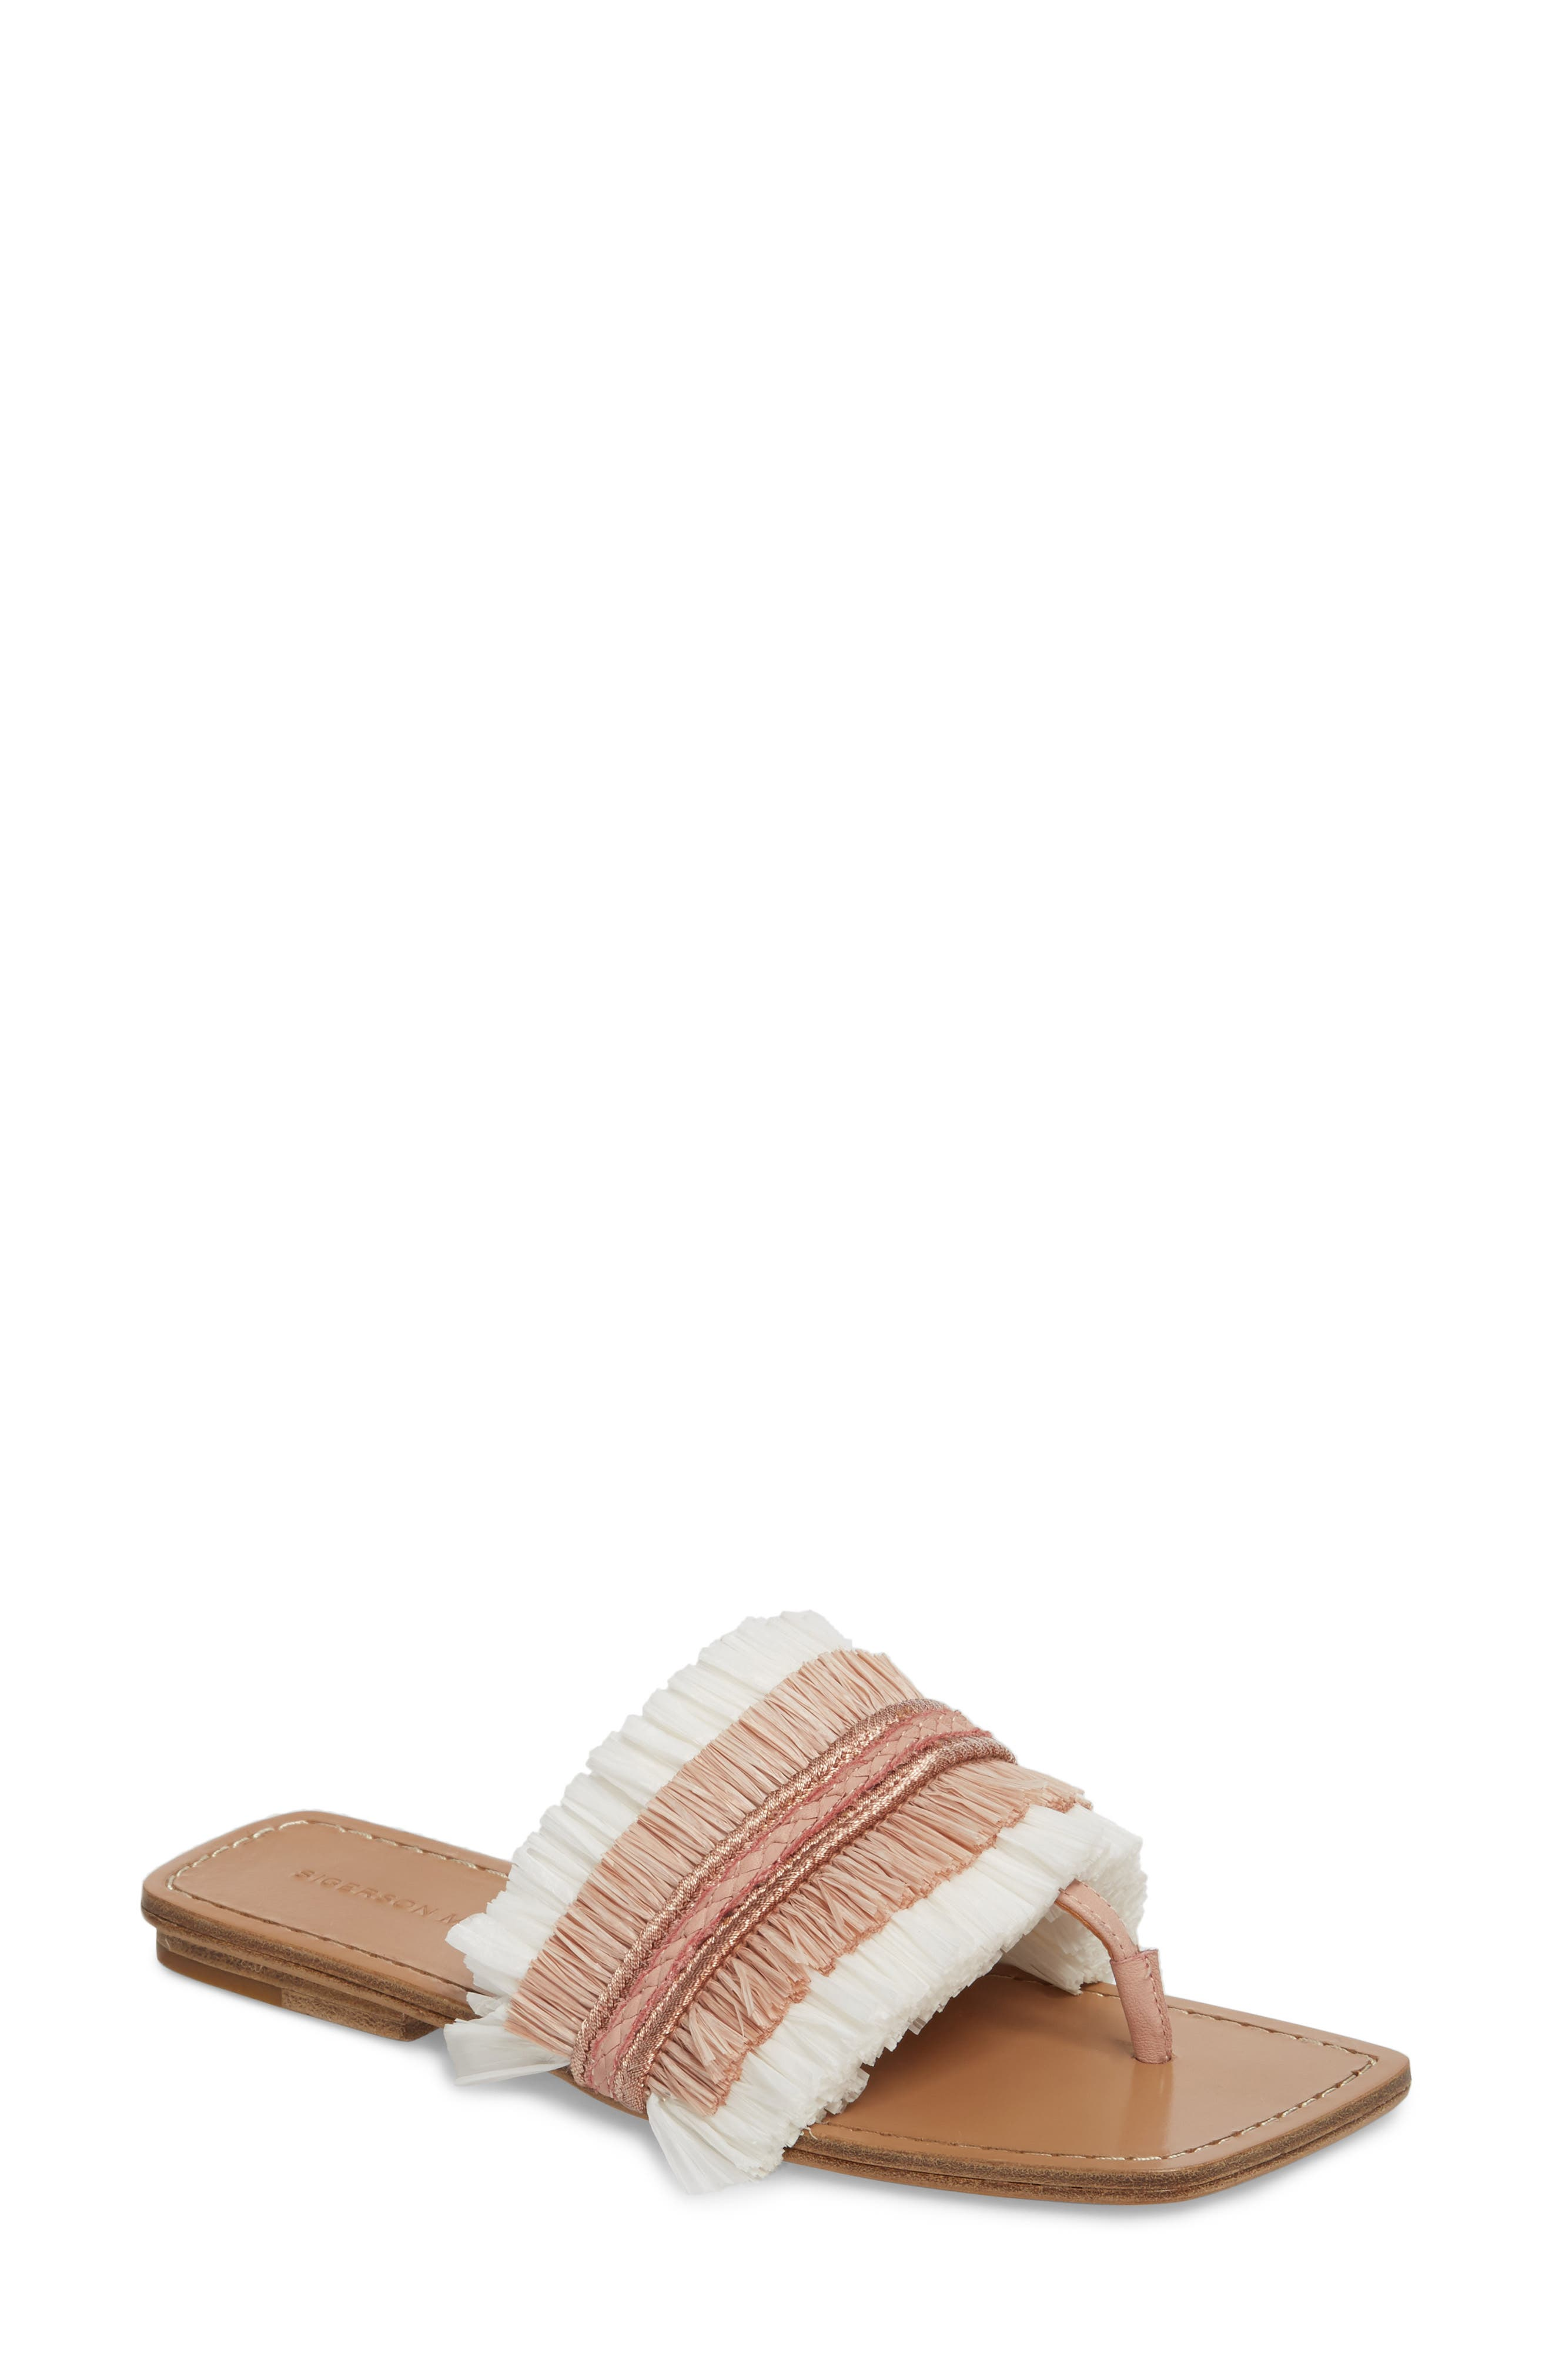 Sigerson Morrison Woven Sandal (Women)